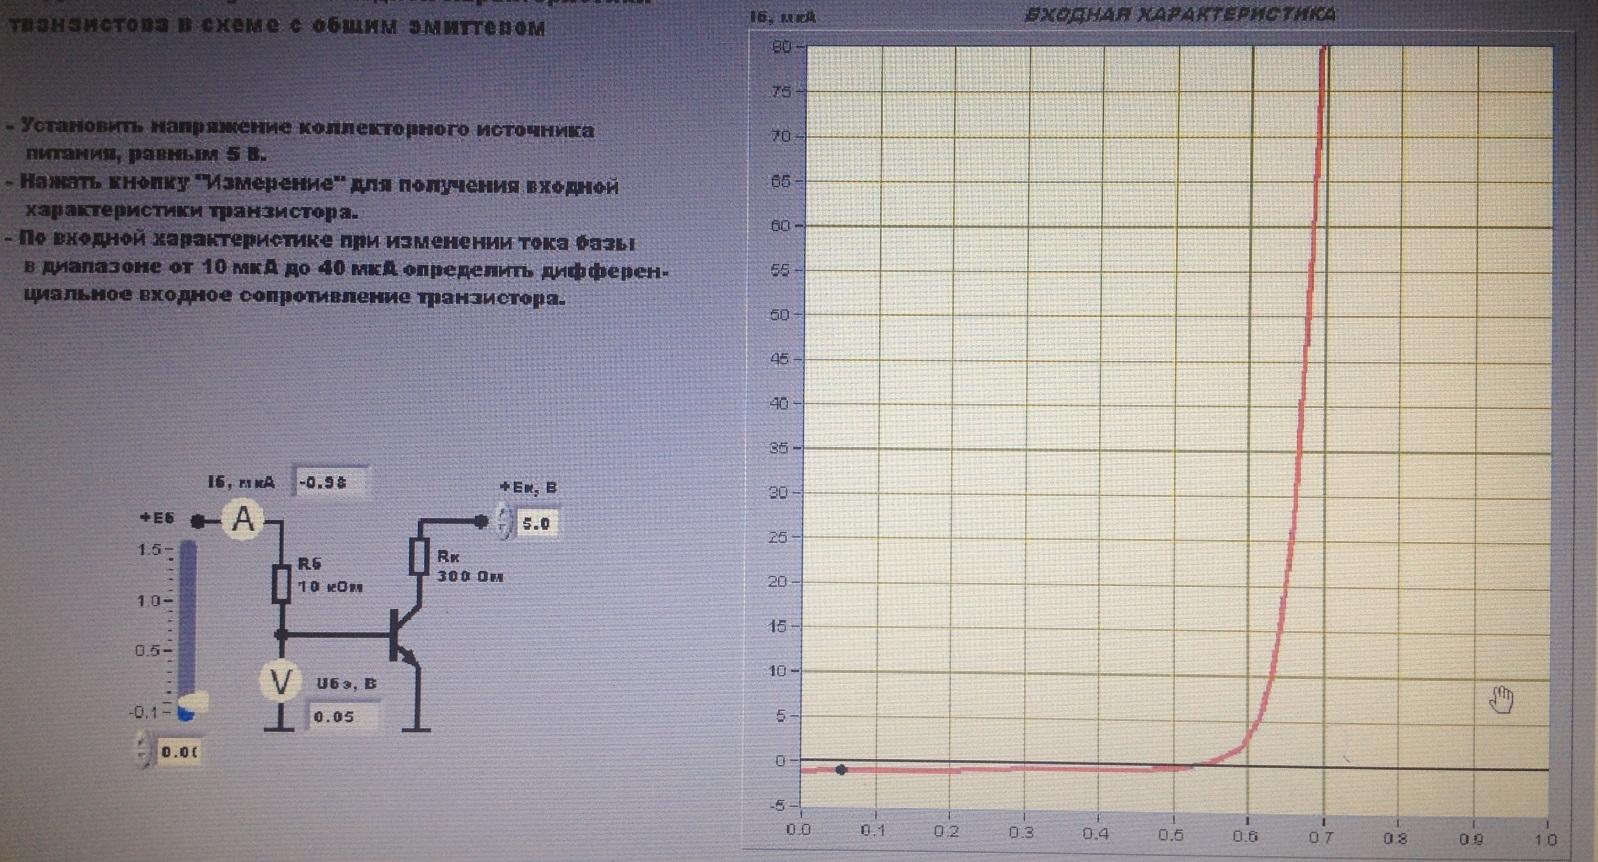 Характеристики биполярного транзистора в схеме с общим эмиттером